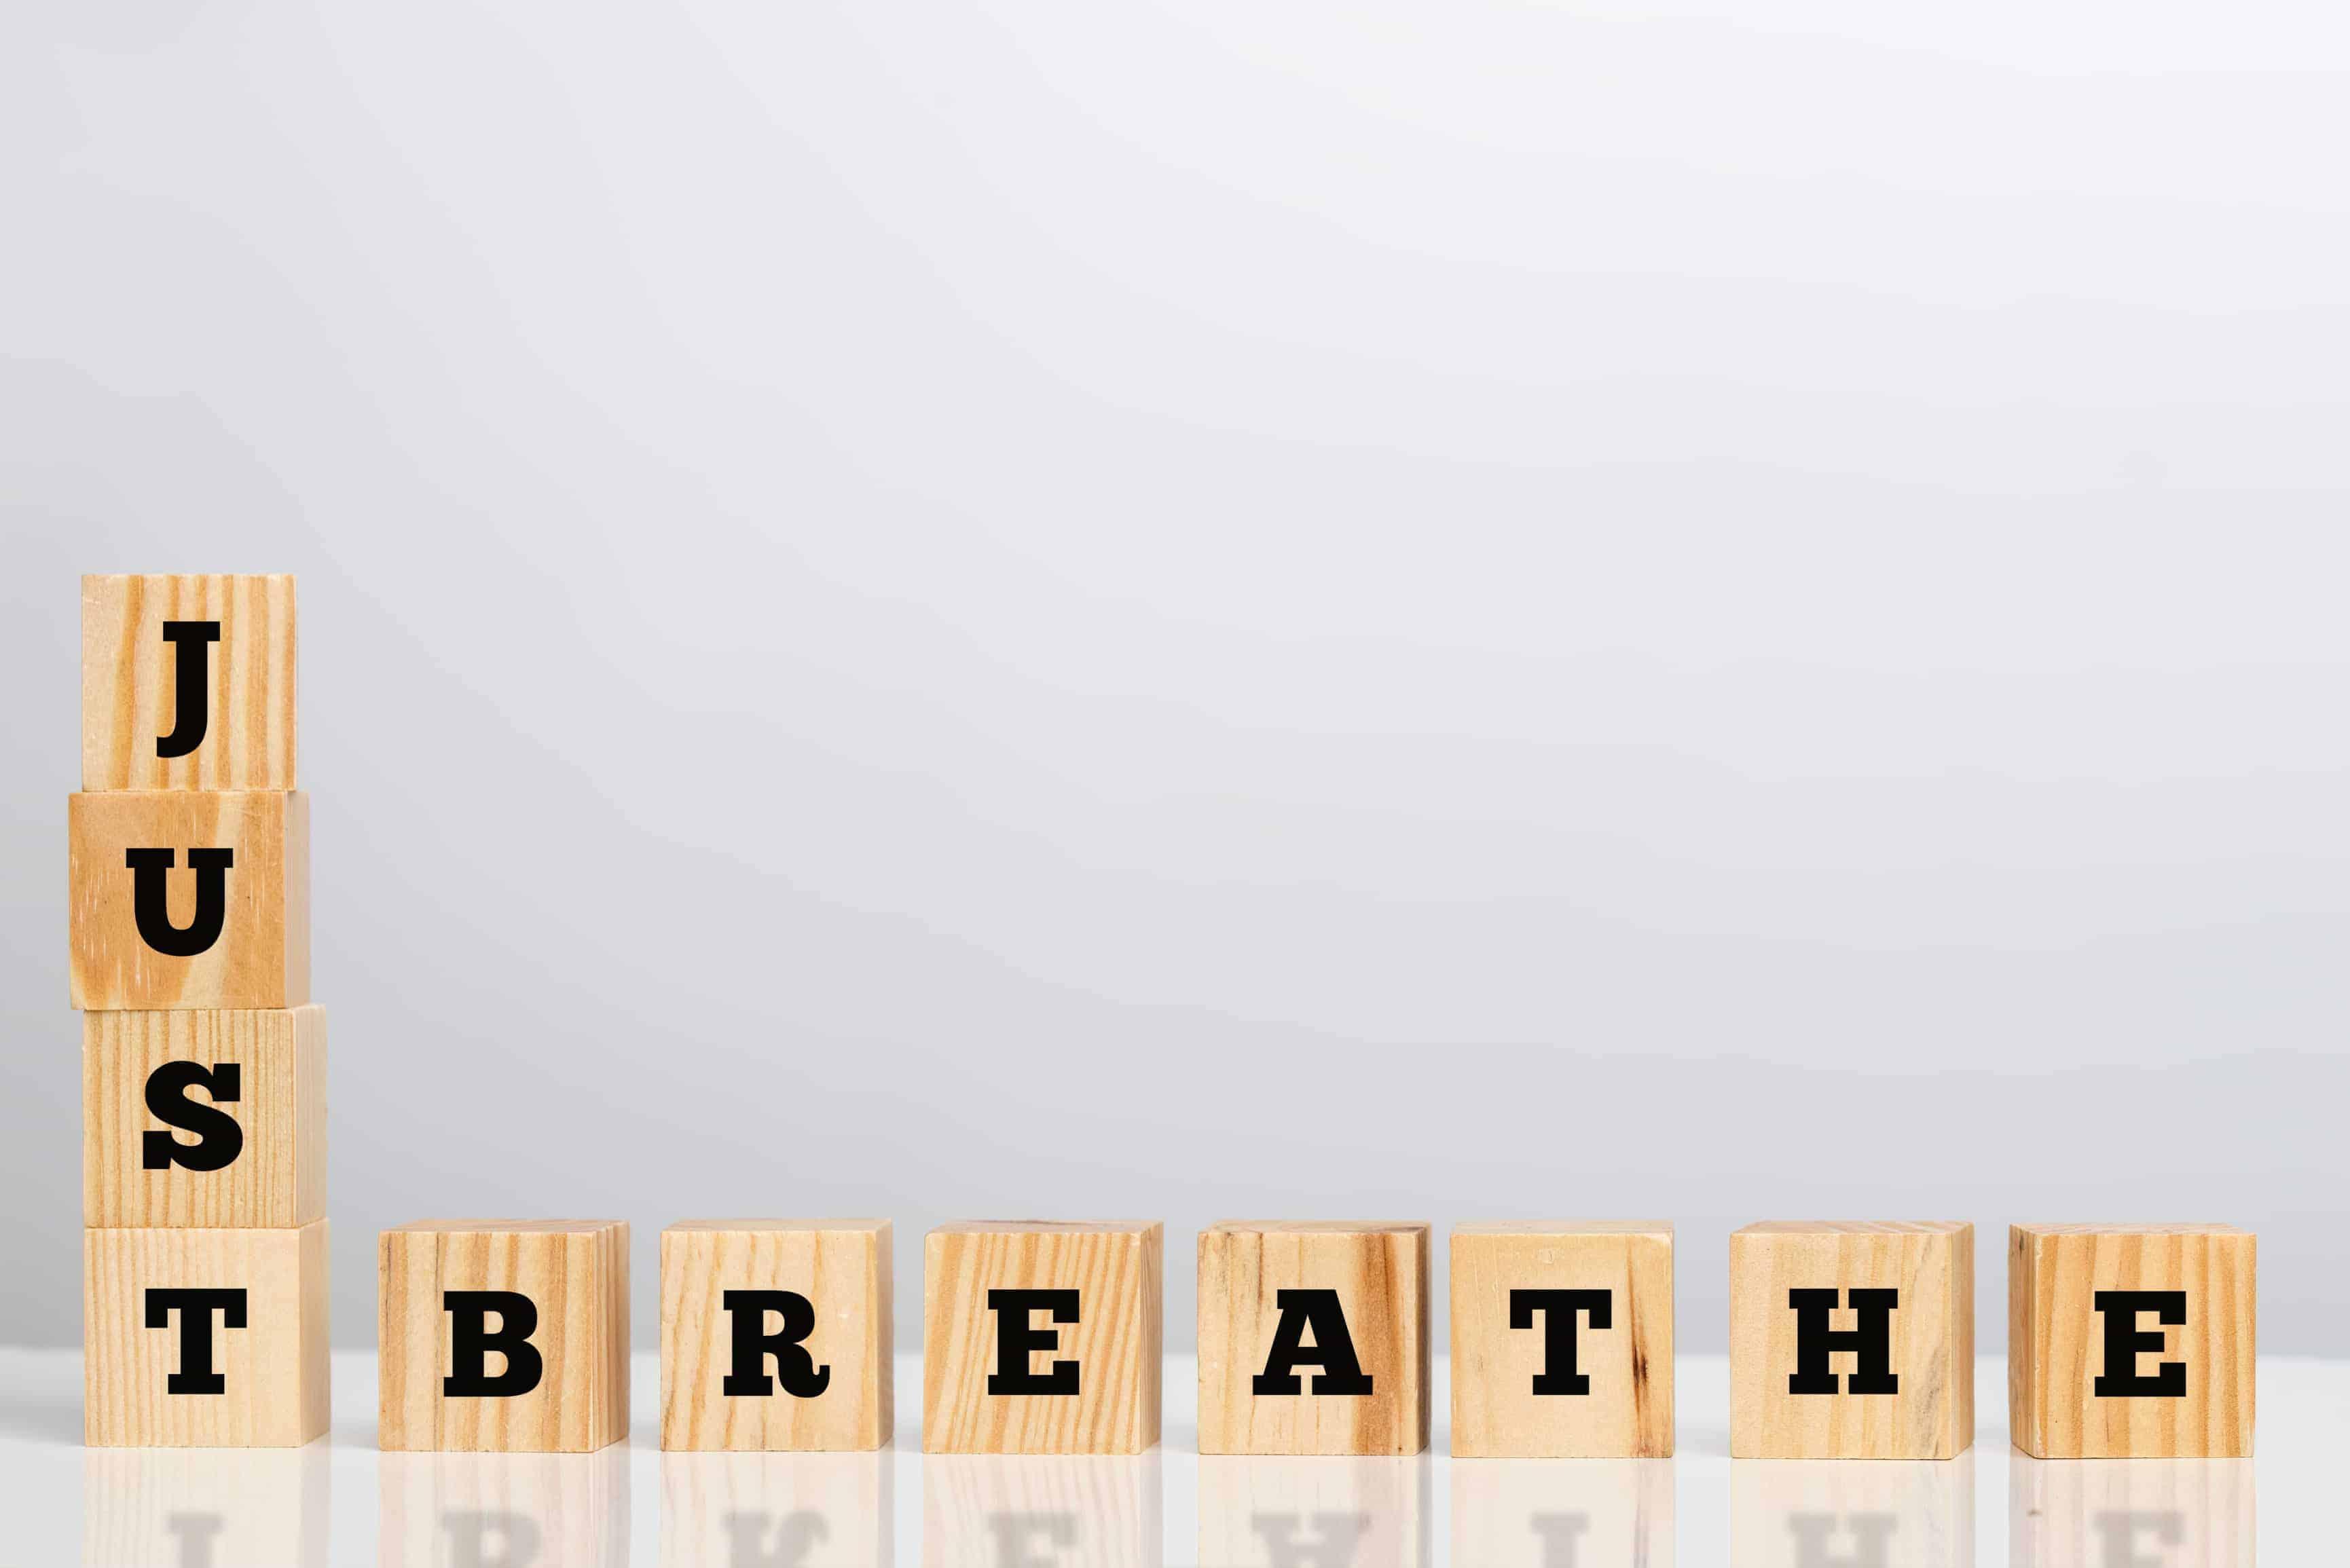 Keep Breathing… Keep Going